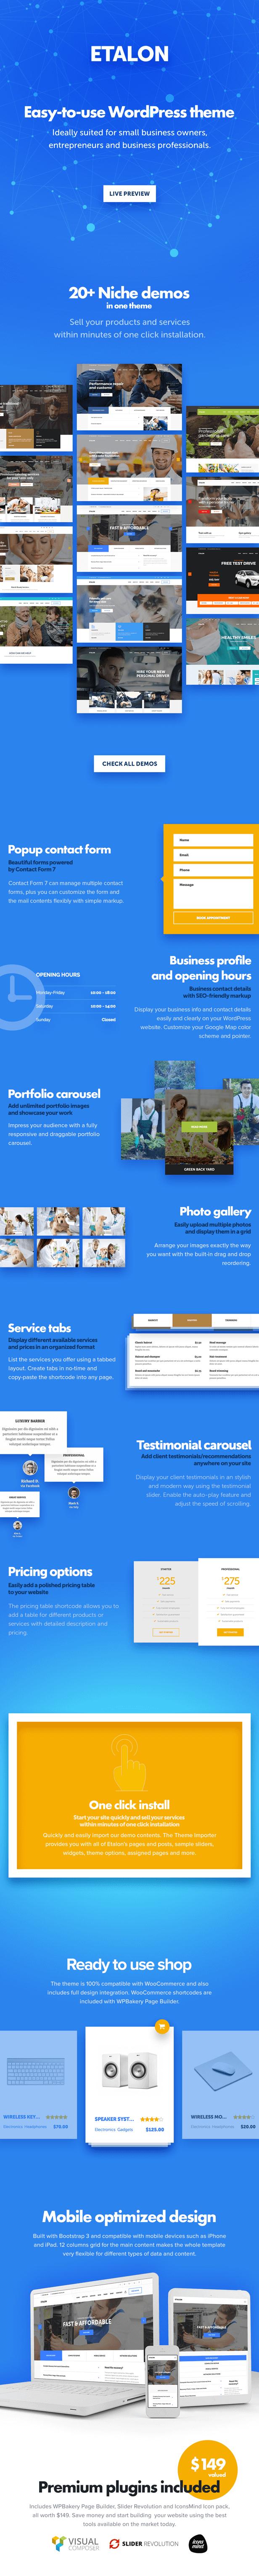 Etalon - Multi-Concept Theme for Professional Services - 1